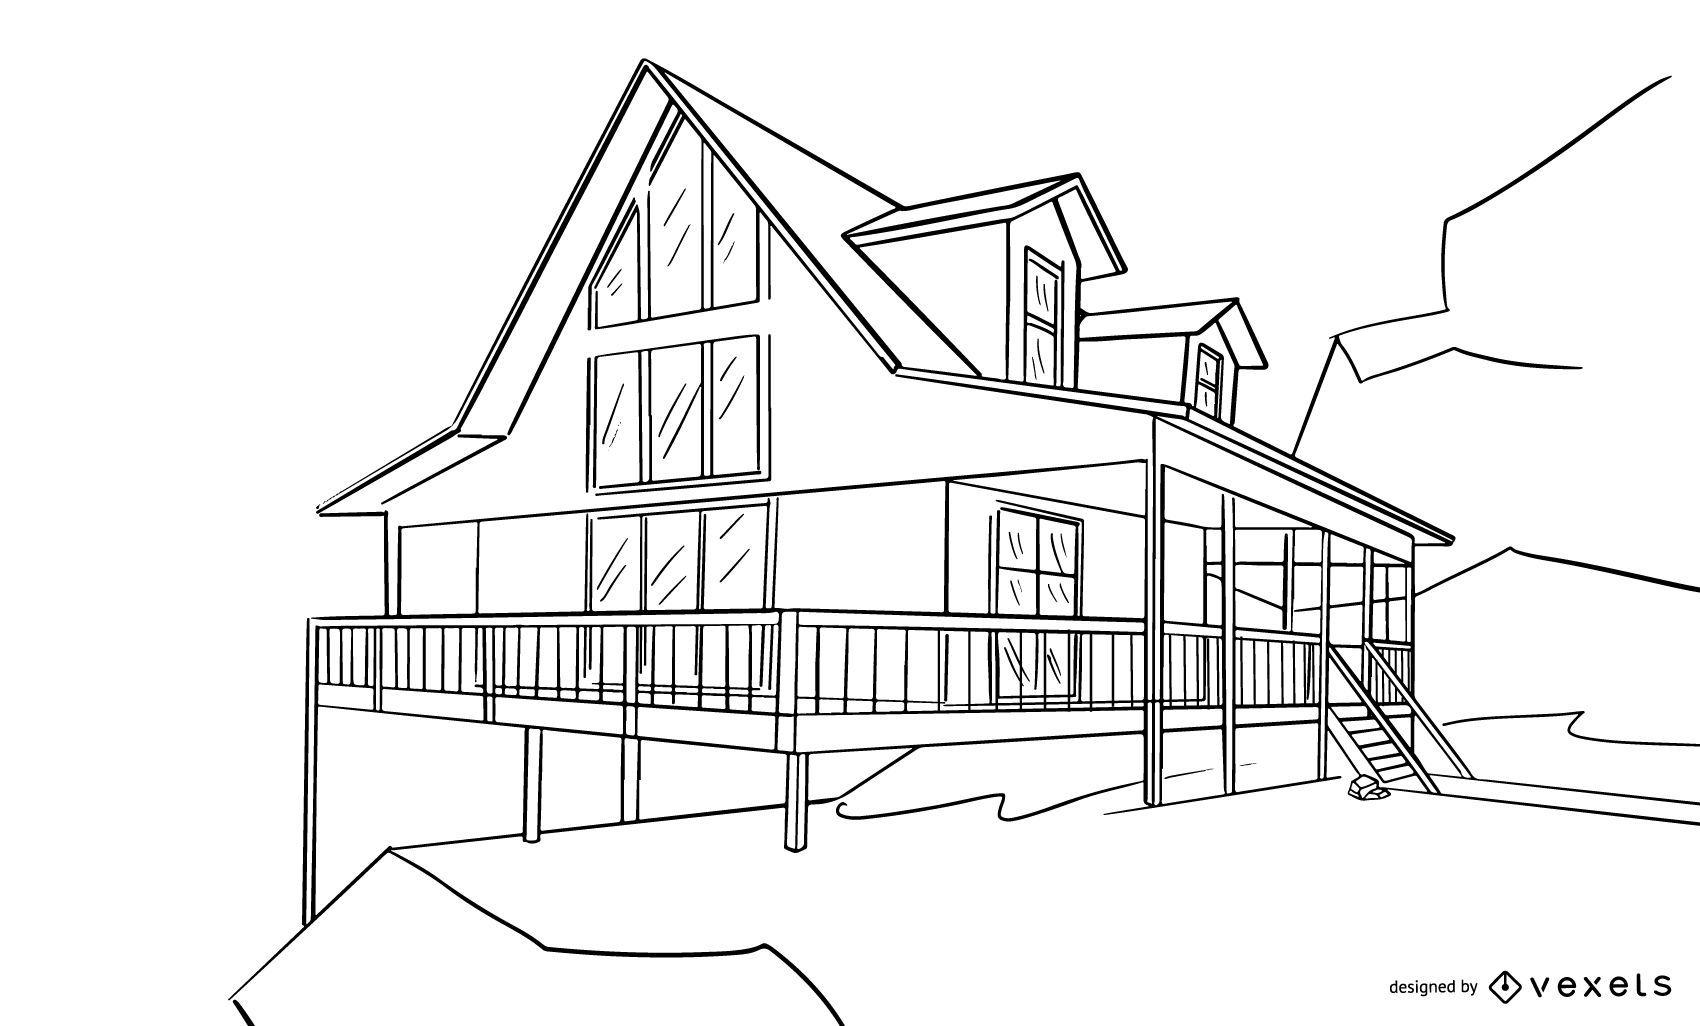 Boceto de diseño de casa arquitectónica